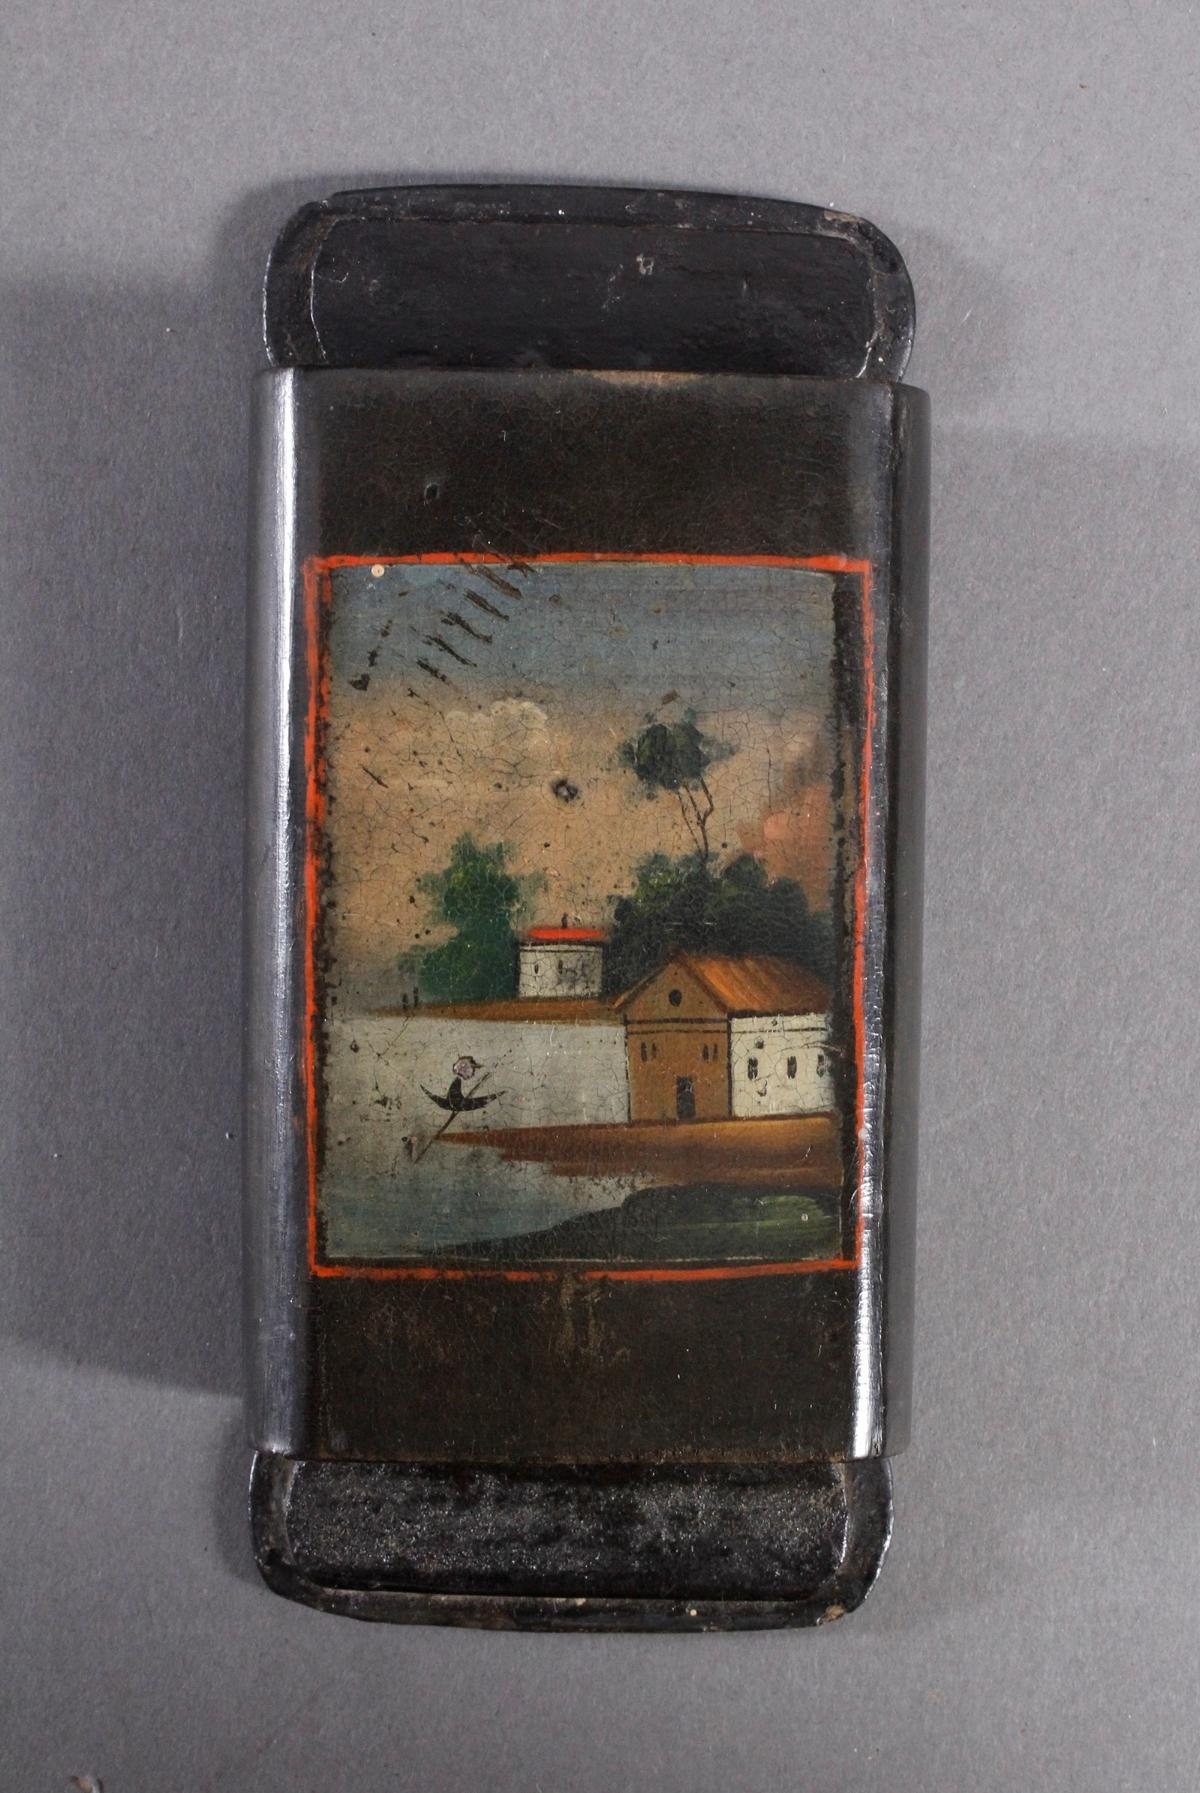 Zigarettenetui, Art Stobwasser 19. Jh.-4